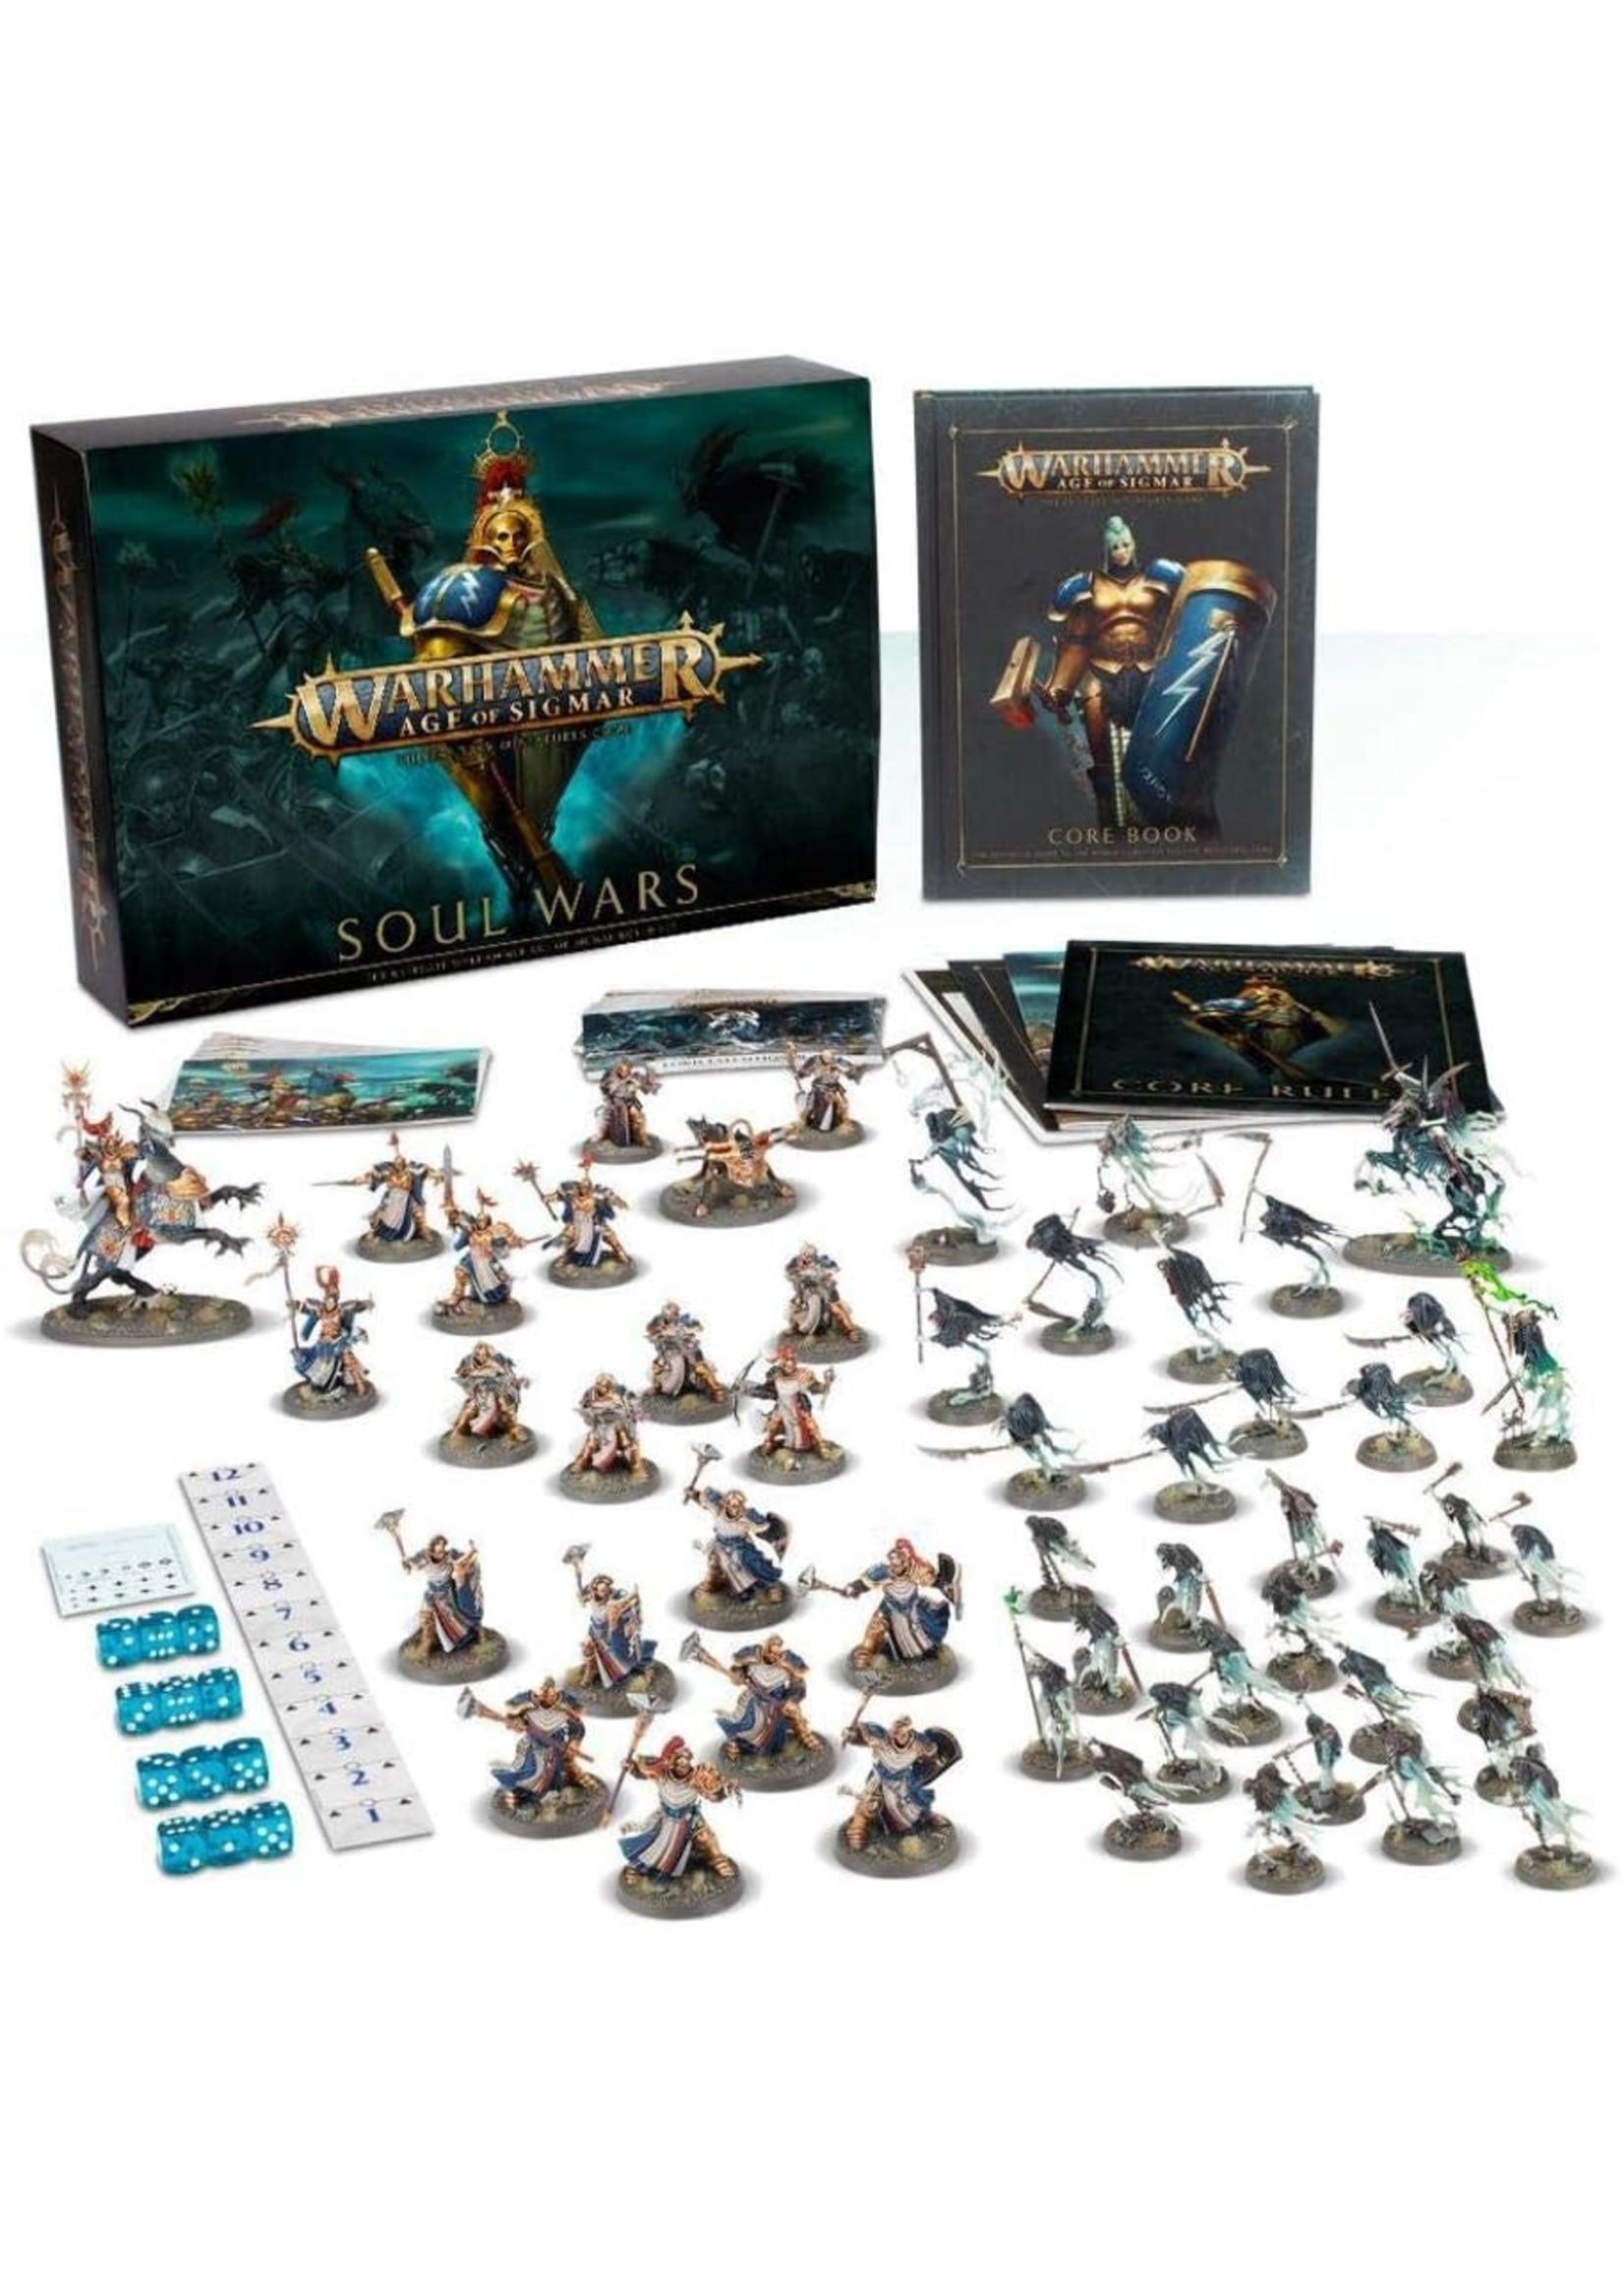 Warhammer: Age of Sigmar Soul Wars